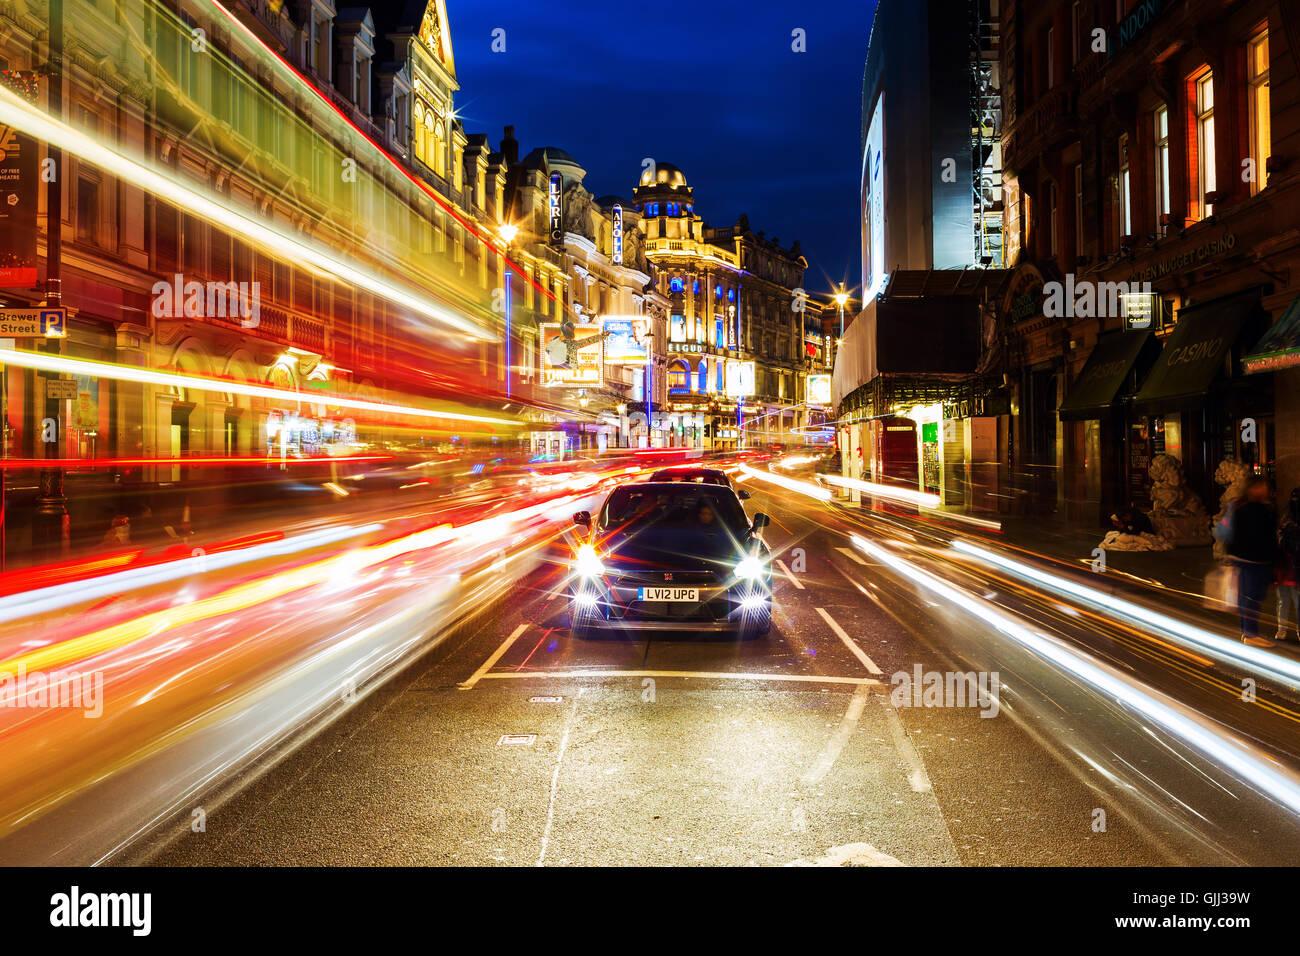 Shaftesbury Avenue in London, UK, in der Nacht Stockbild